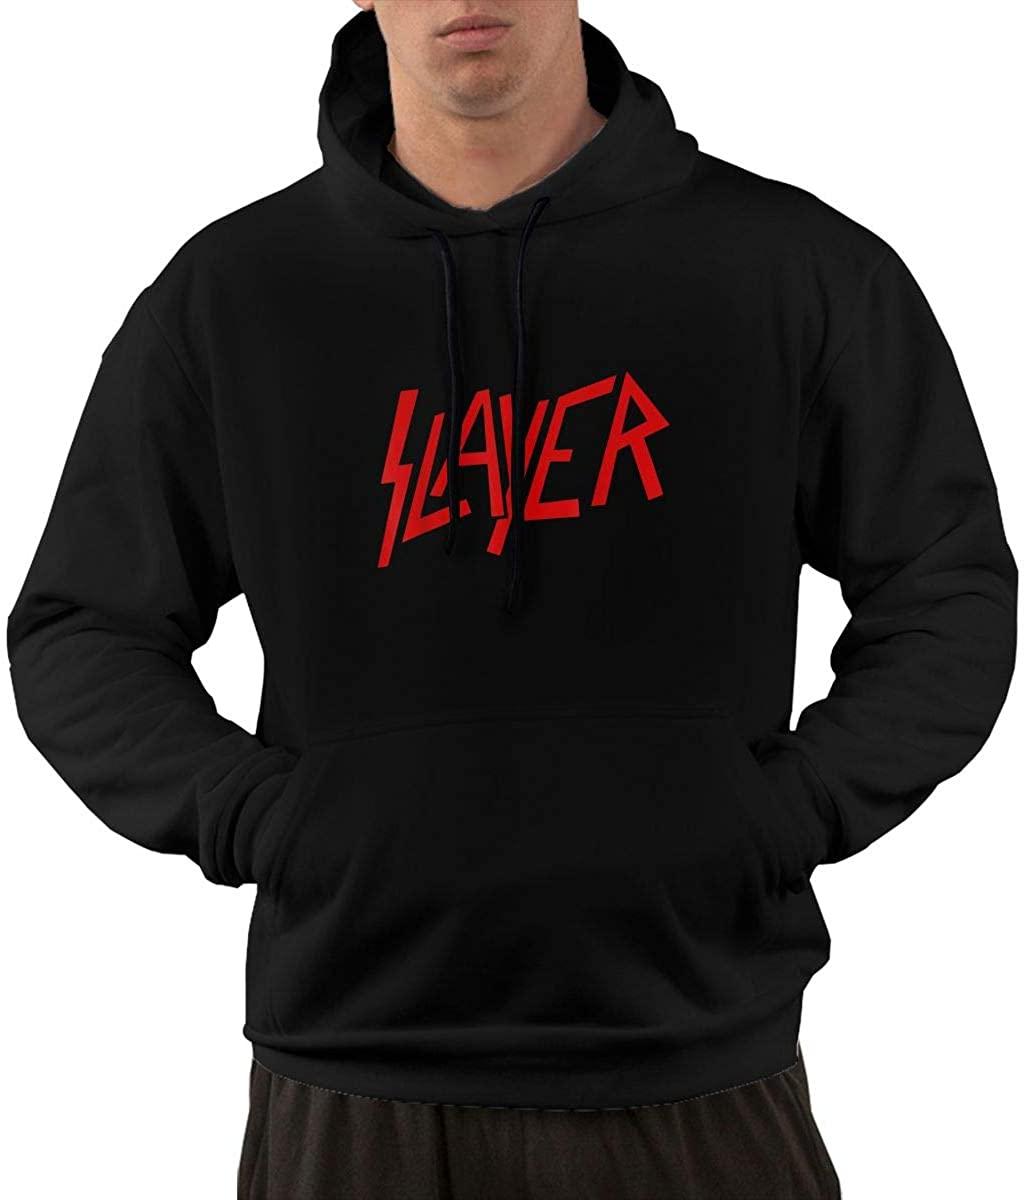 Fanniemo Menâ€sslayer Cotton Heavyweight Pullover Hoodie Sweatshirt